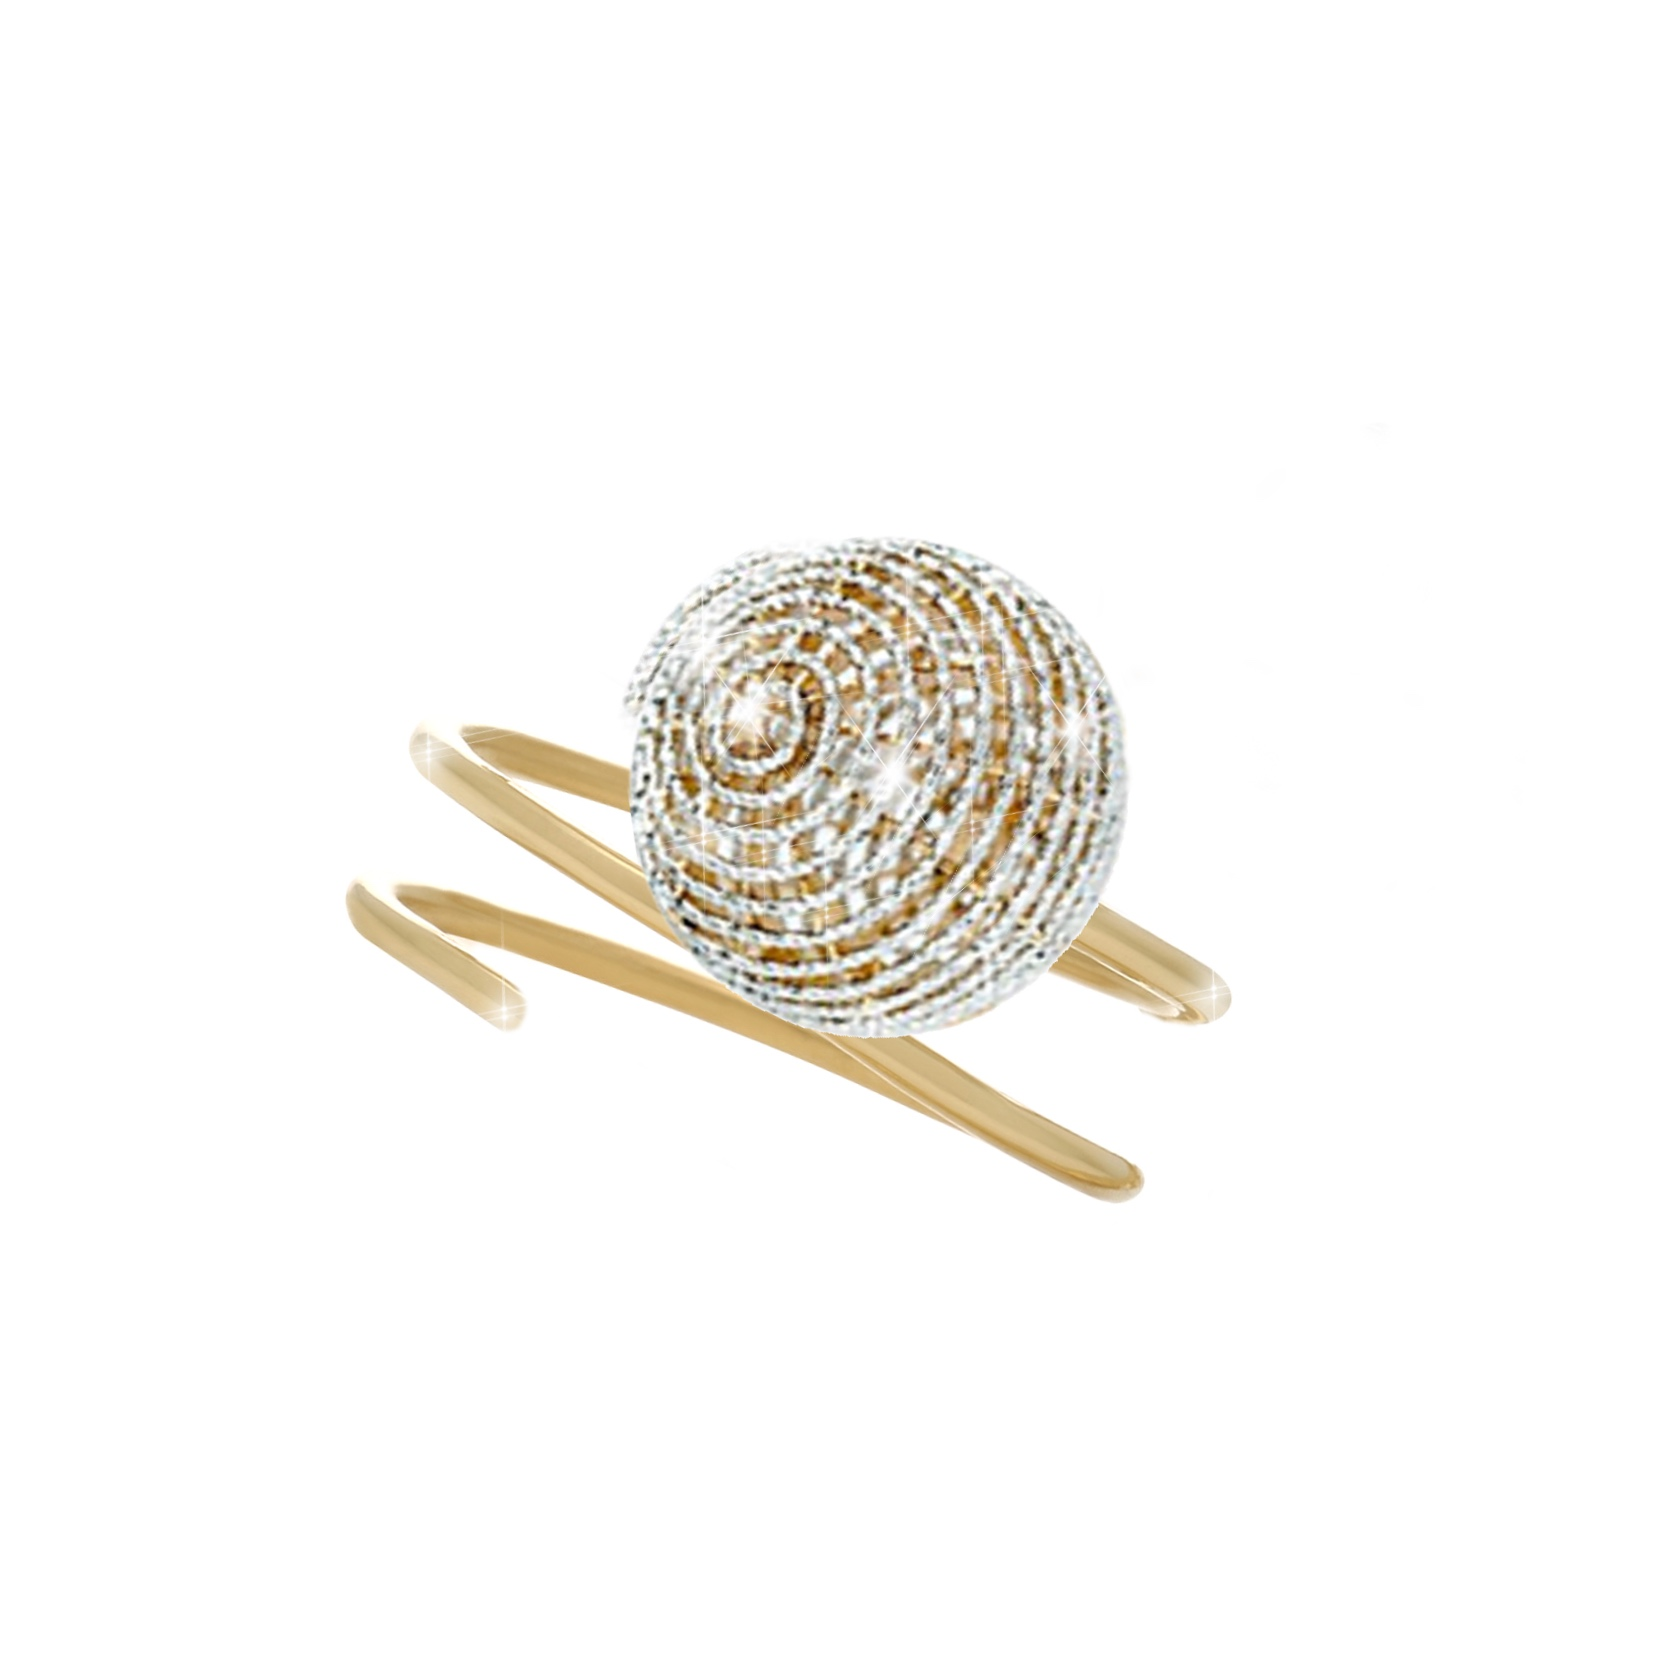 deepa-gold-diamond-ring-fine-jewelry-giuliana-mancinelli-bonafaccia.jpg